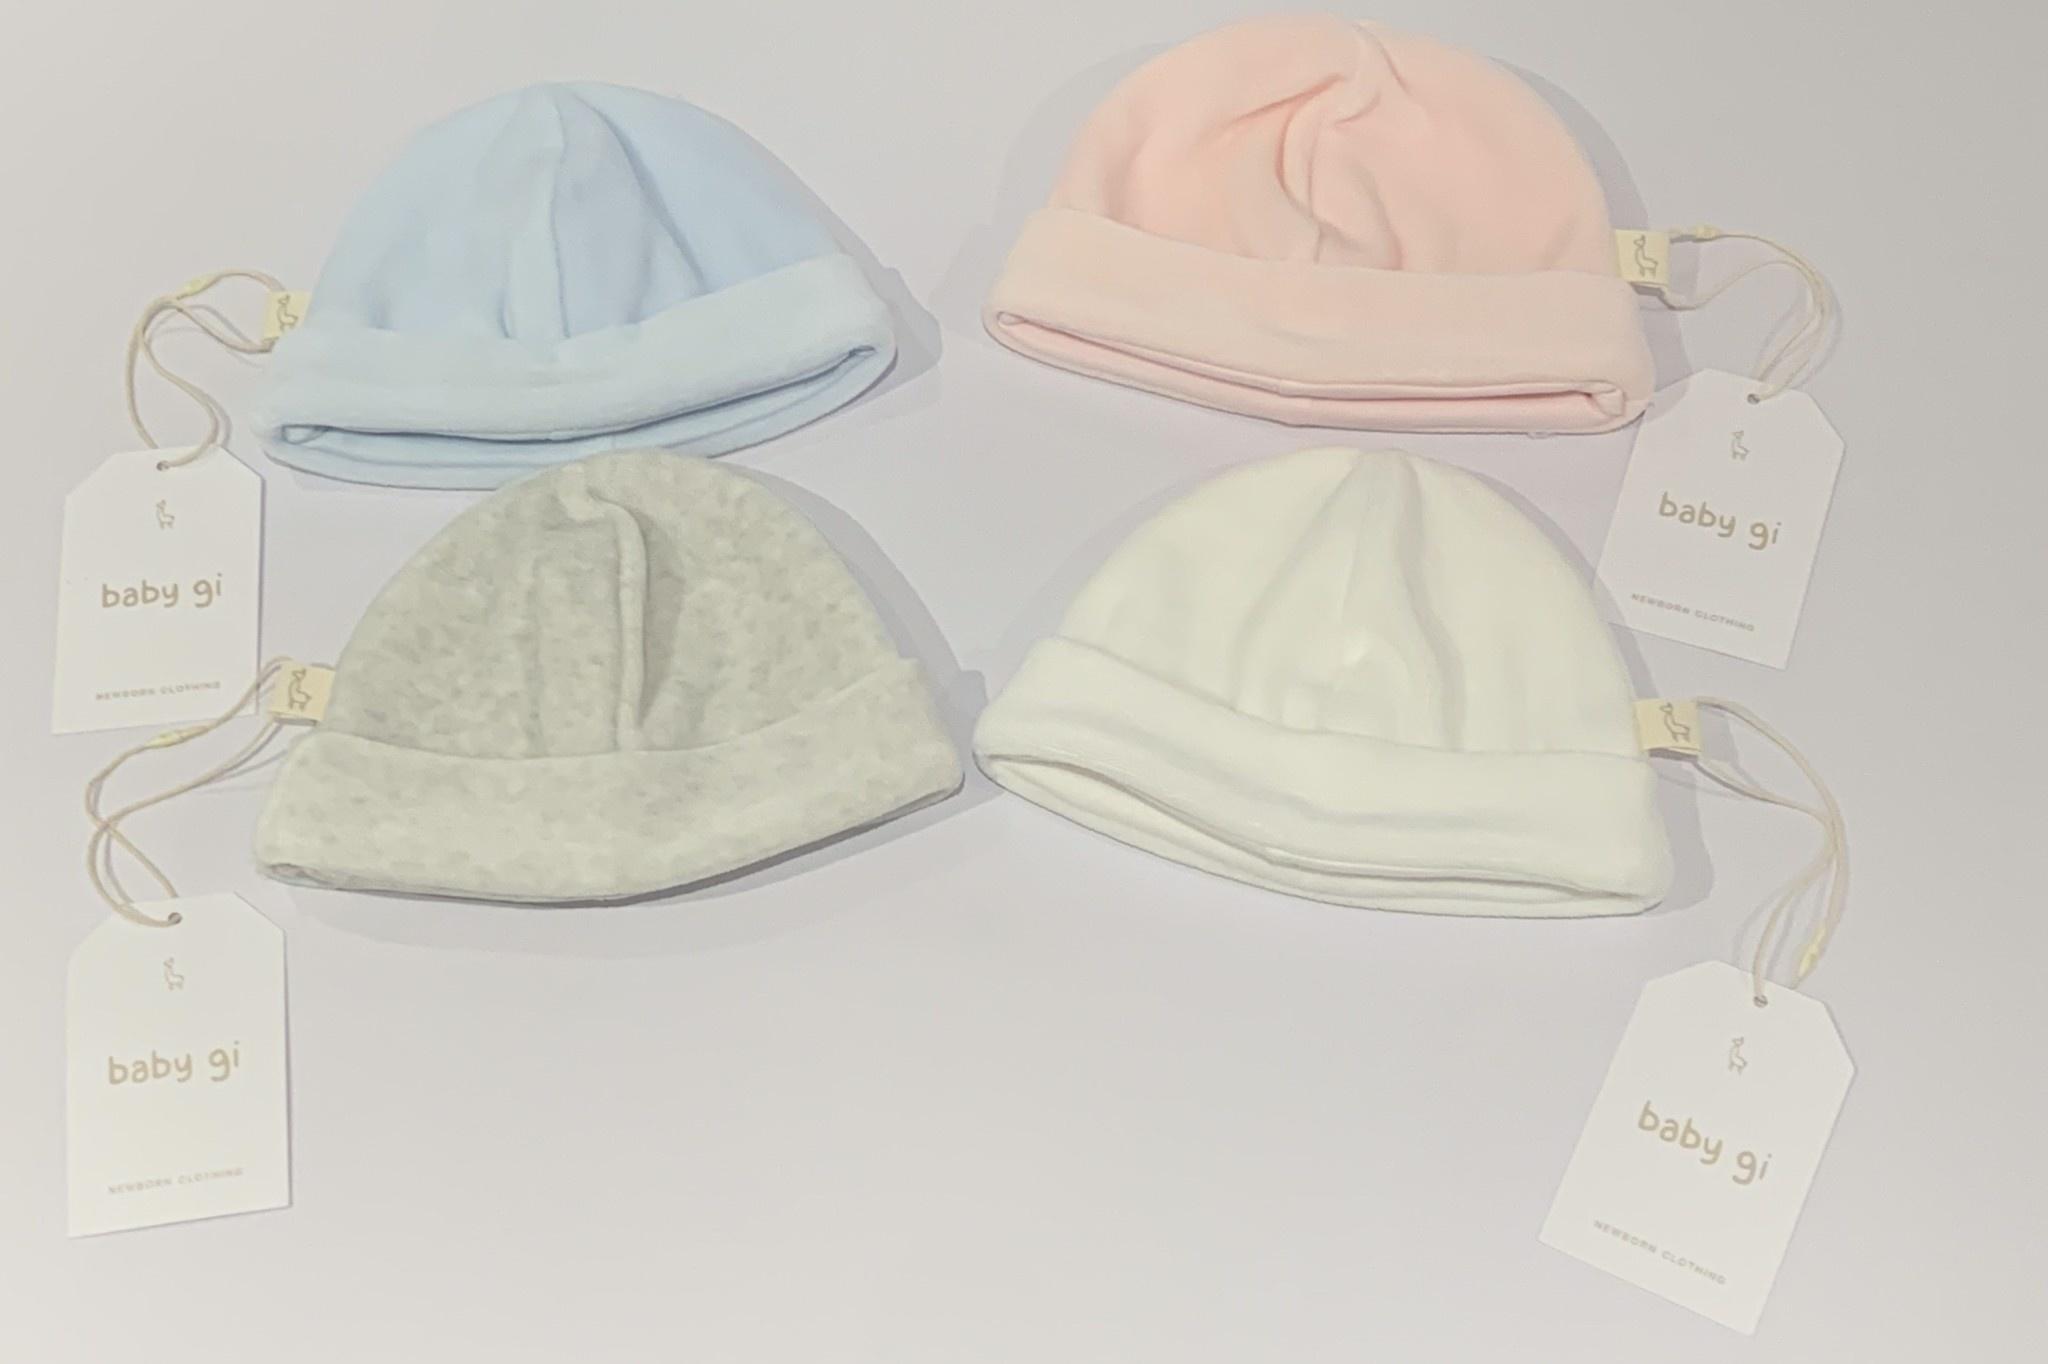 Baby Gi Baby gi Velour hat 0-1 Month